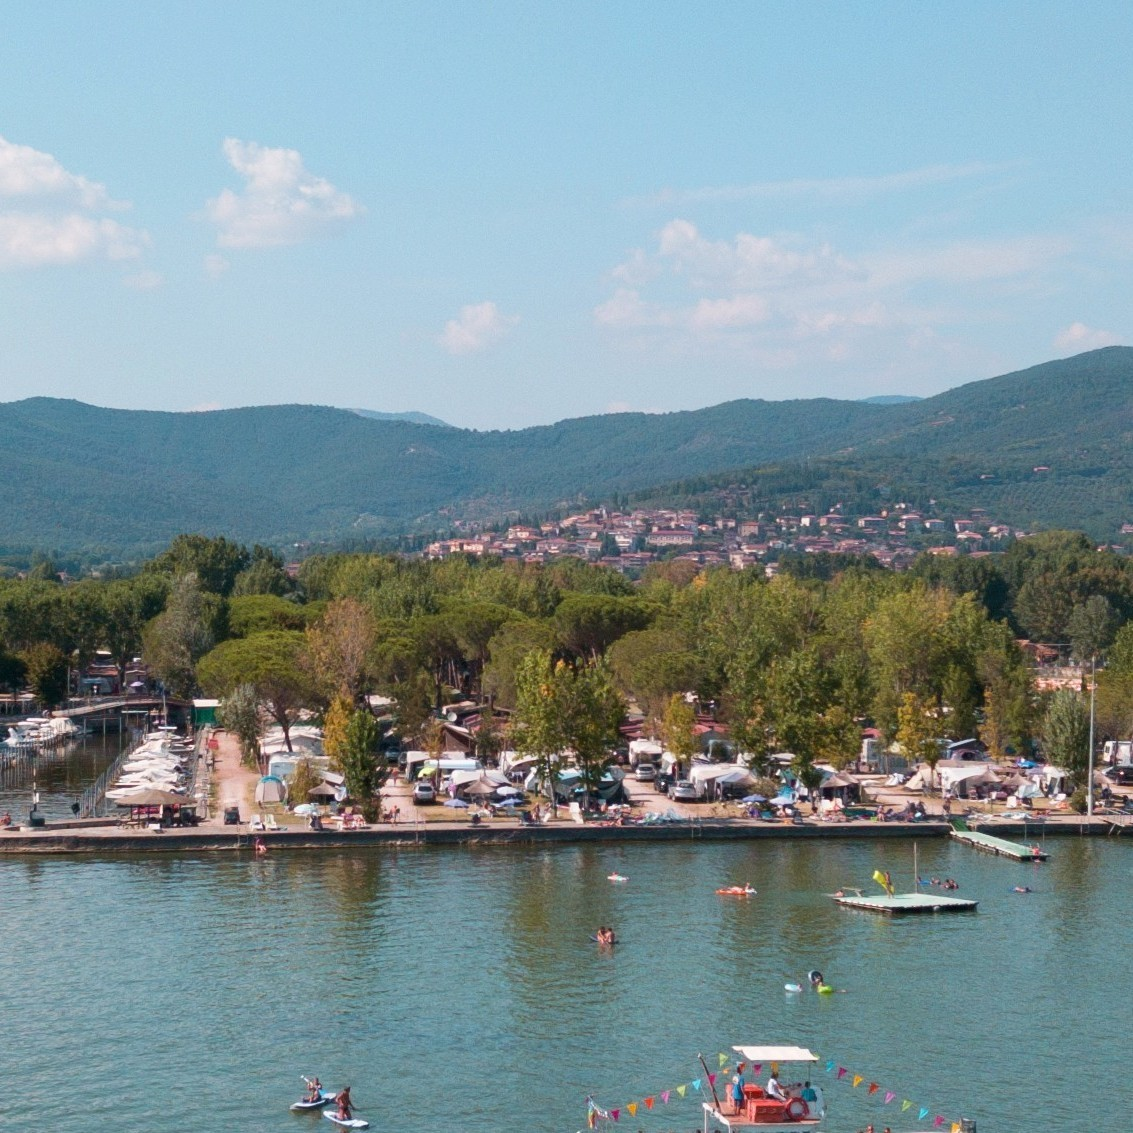 Znáte jezero Trasimeno?